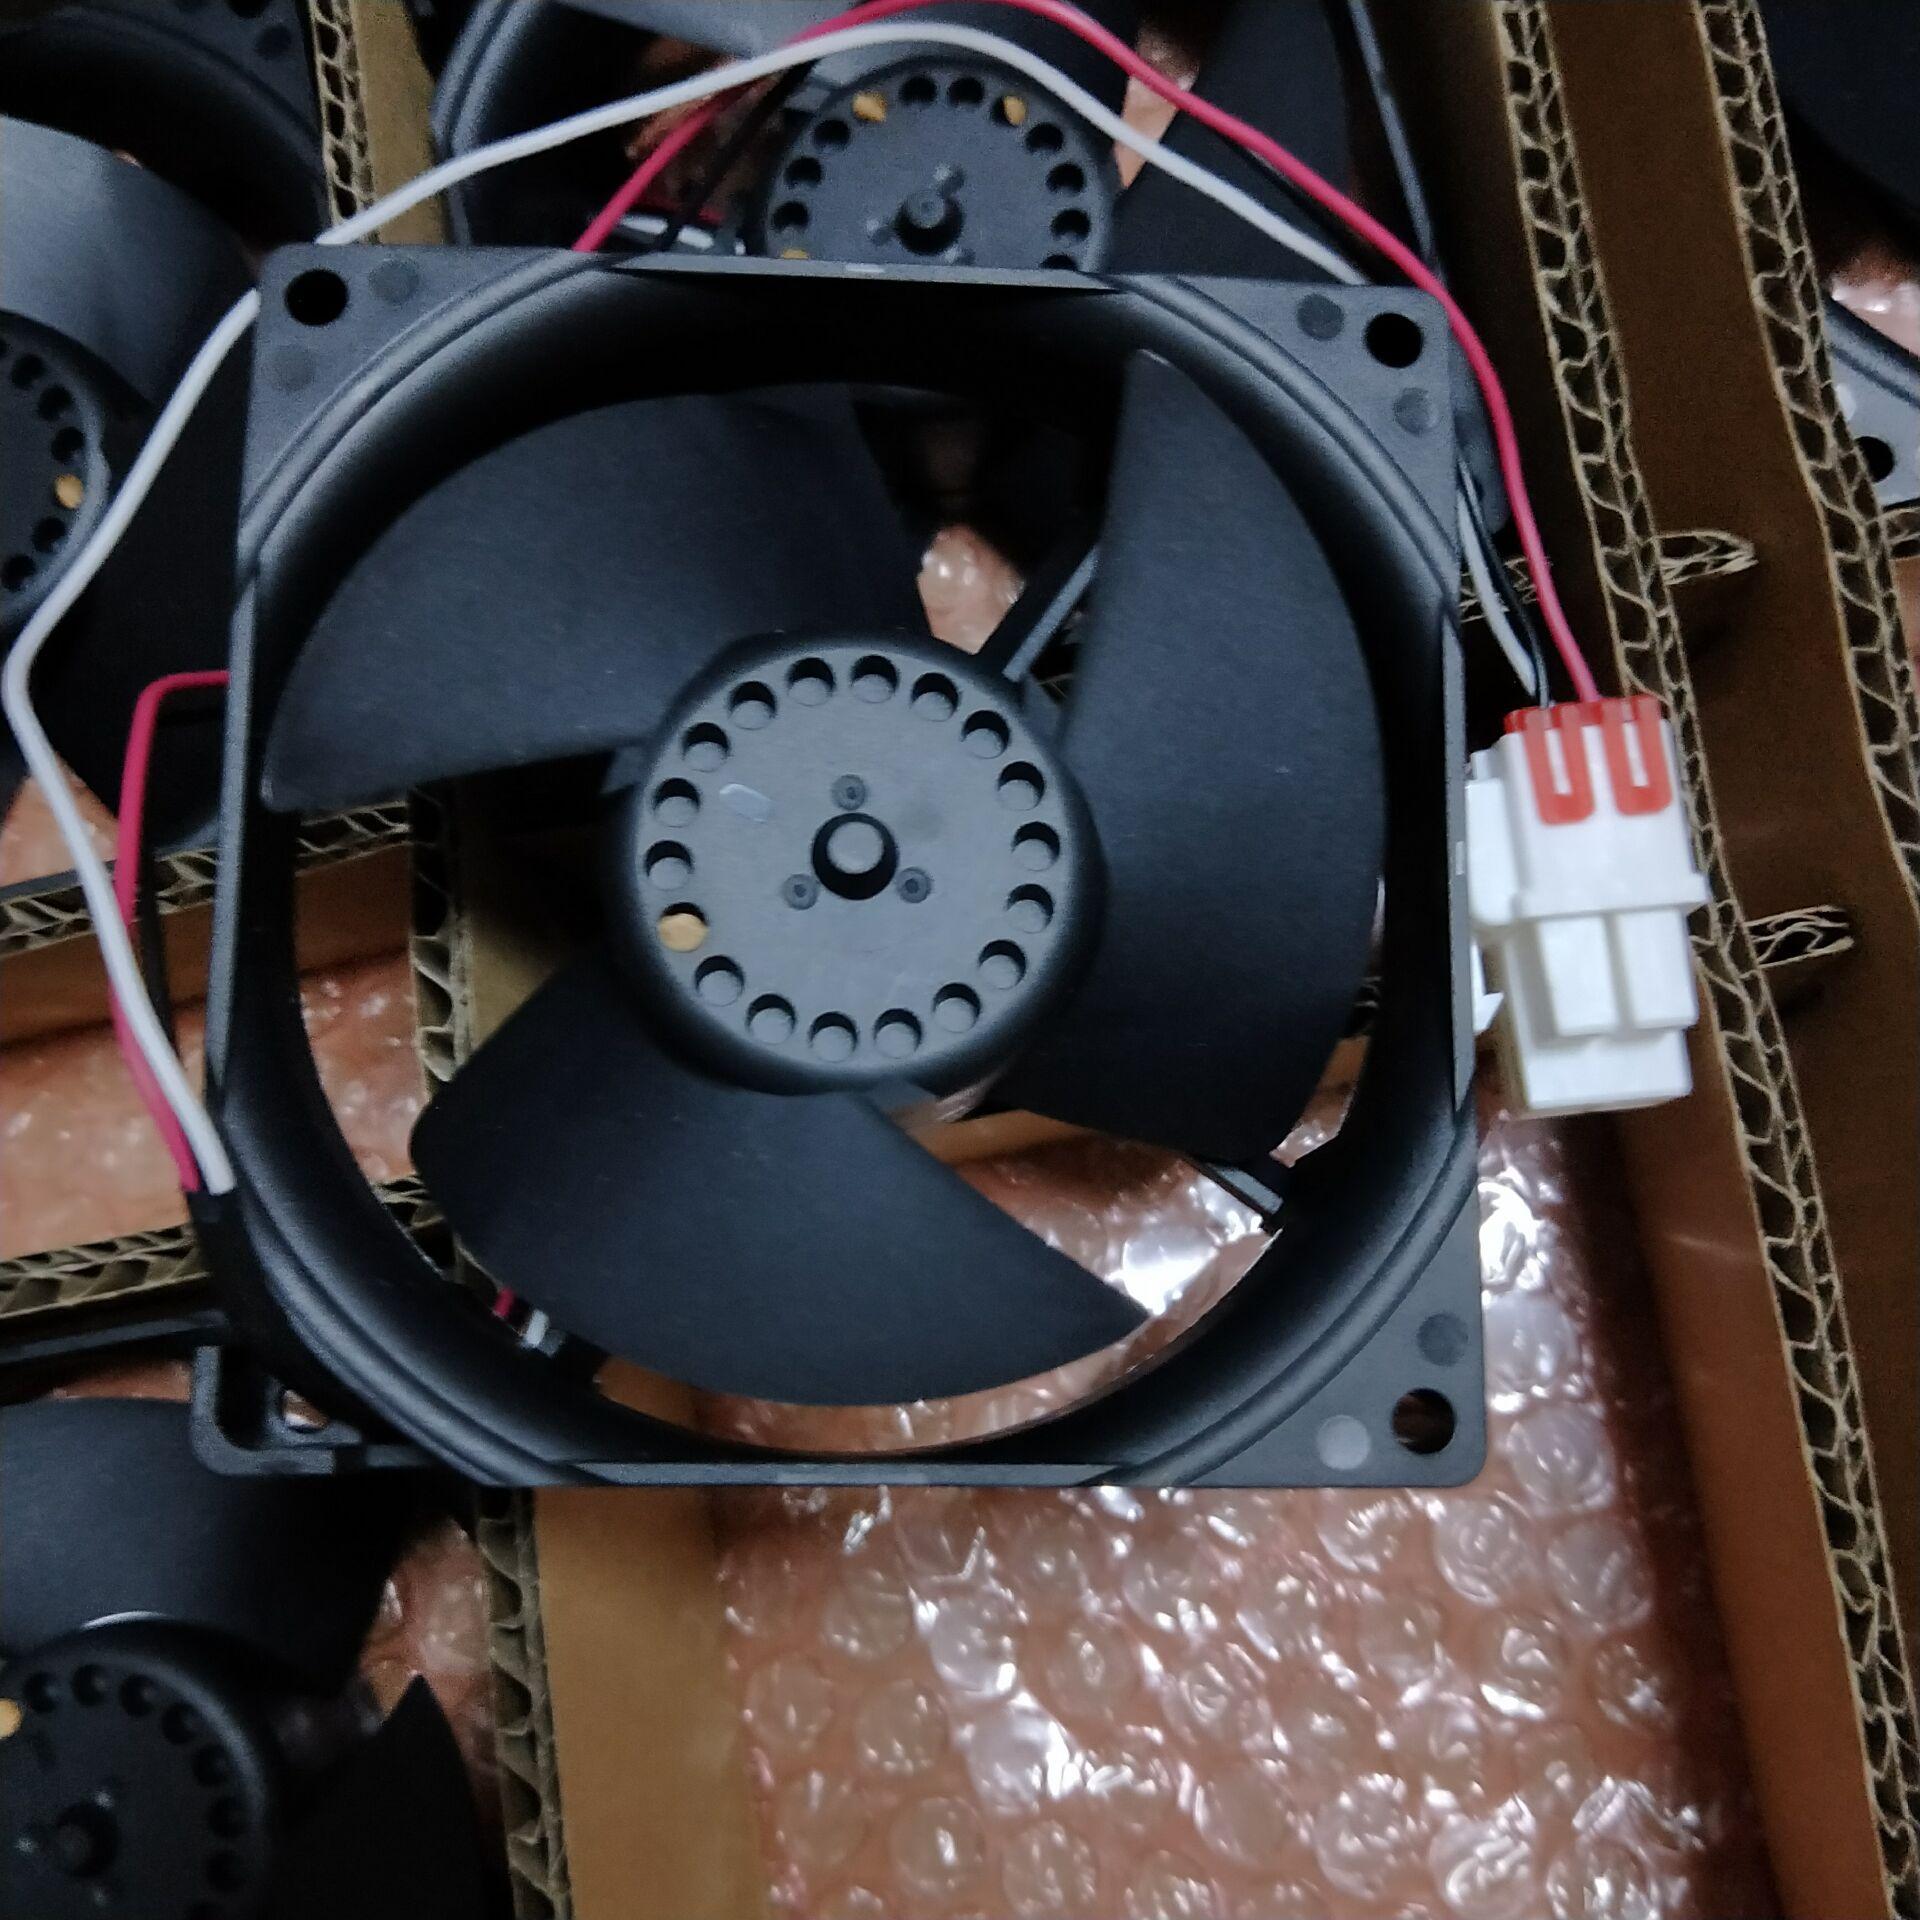 NMB-MAT 3612JL-04W-S49 12V 0.3A 9.2cm for Samsung Refrigerator Accessories fan